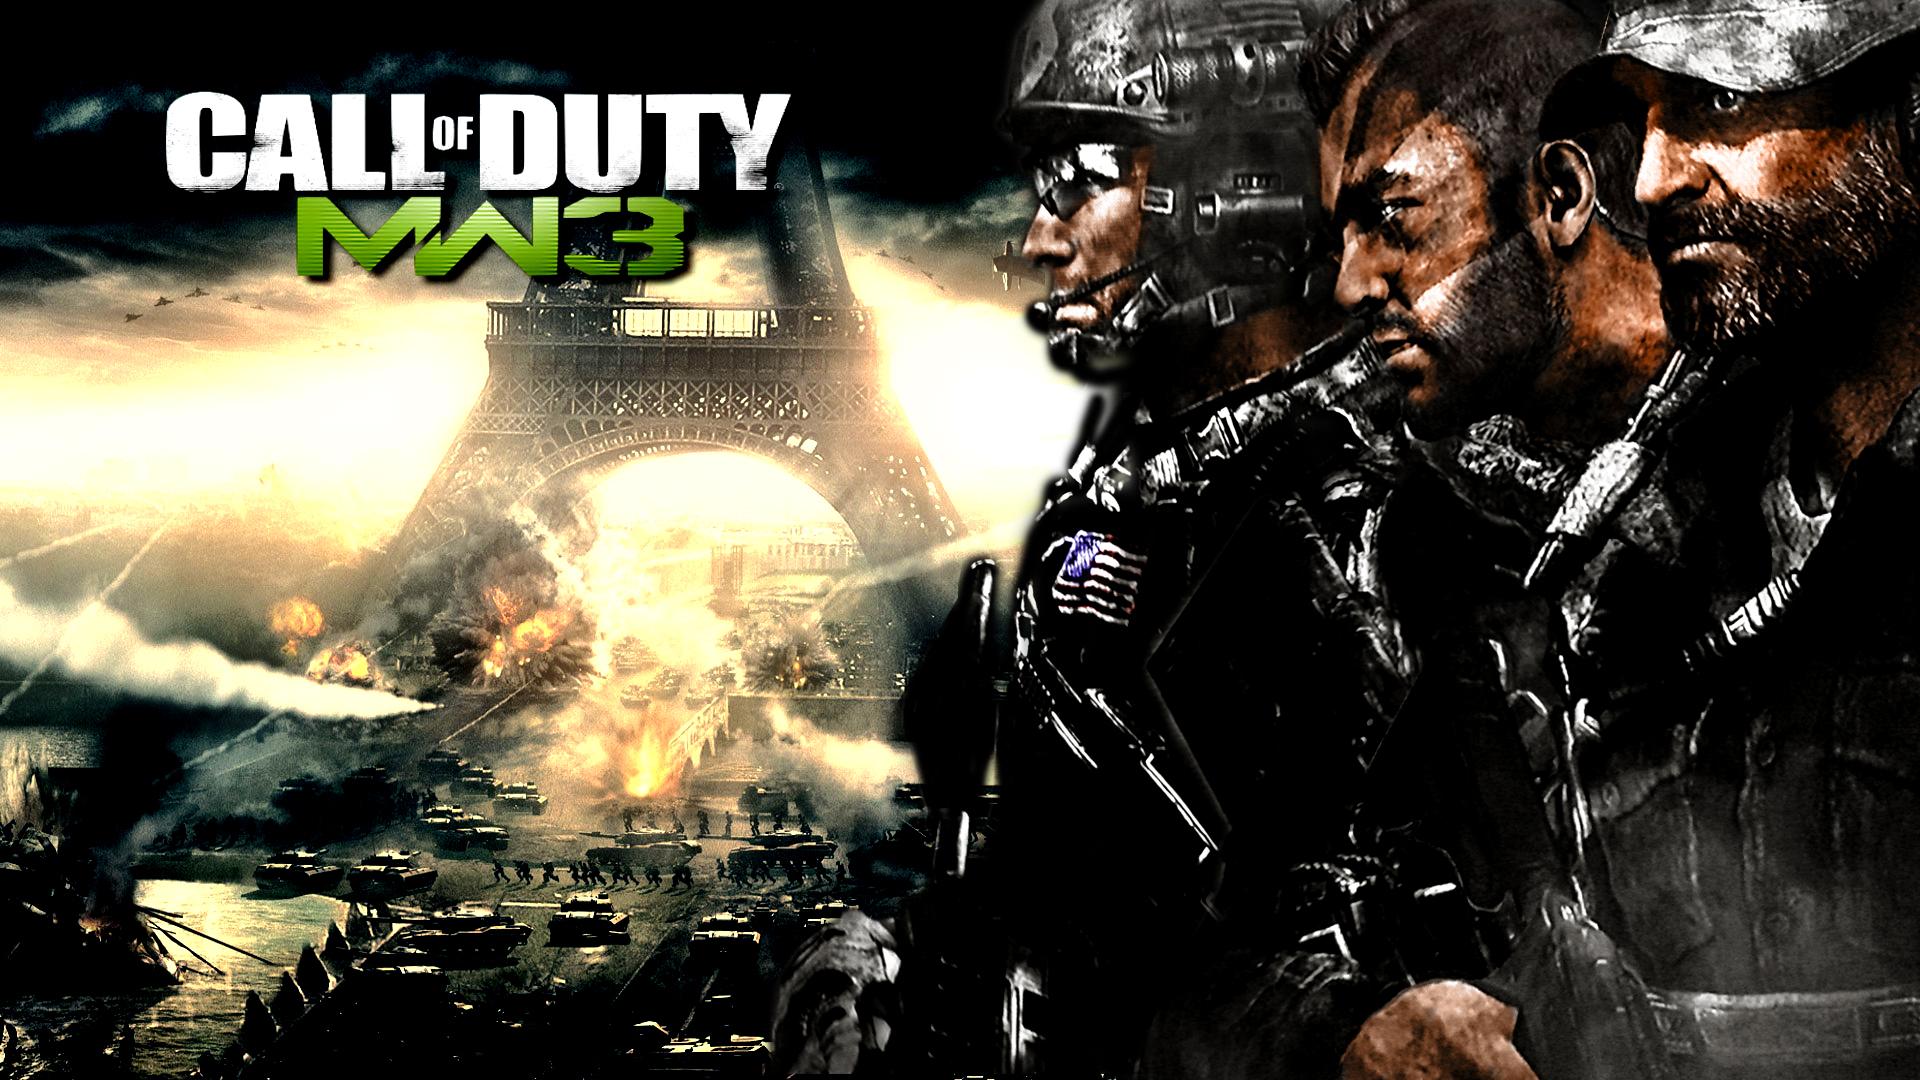 download Call Of Duty Modern Warfare 3 Wallpaper Hd 257899 1920x1080